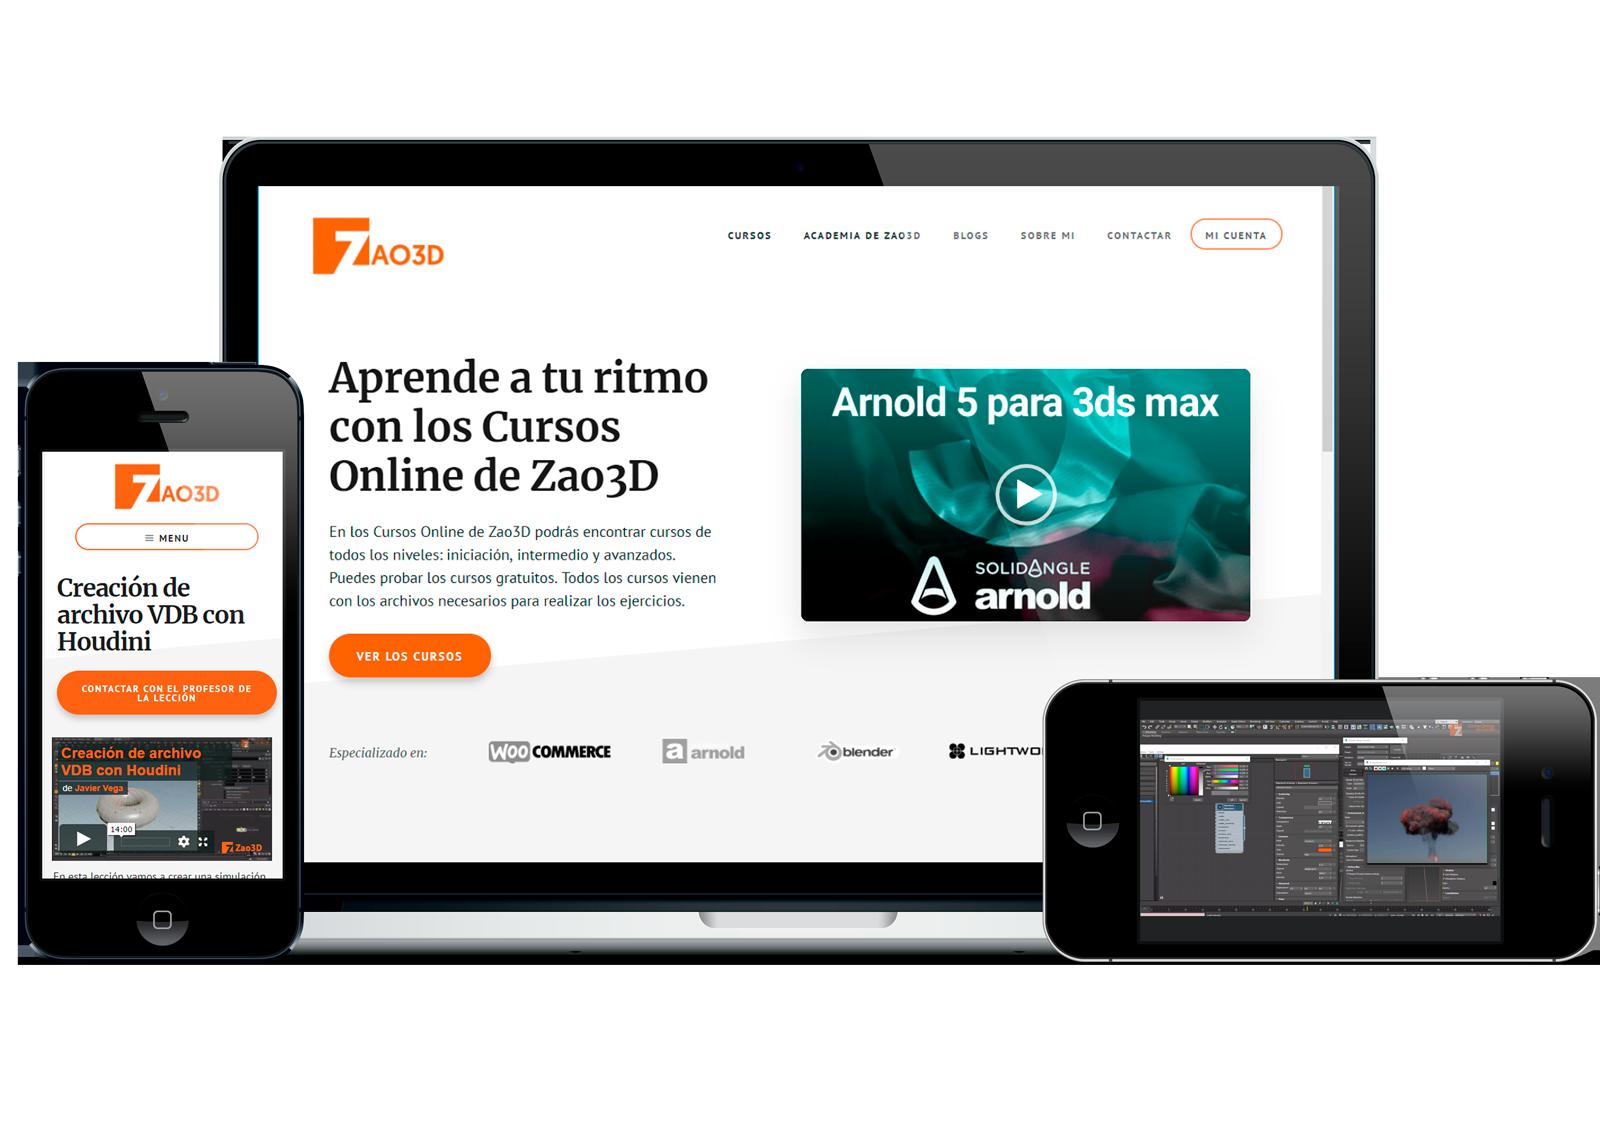 https://www.zao3d.com/wp-content/uploads/2017/12/home-dispositivos-zao3d.png